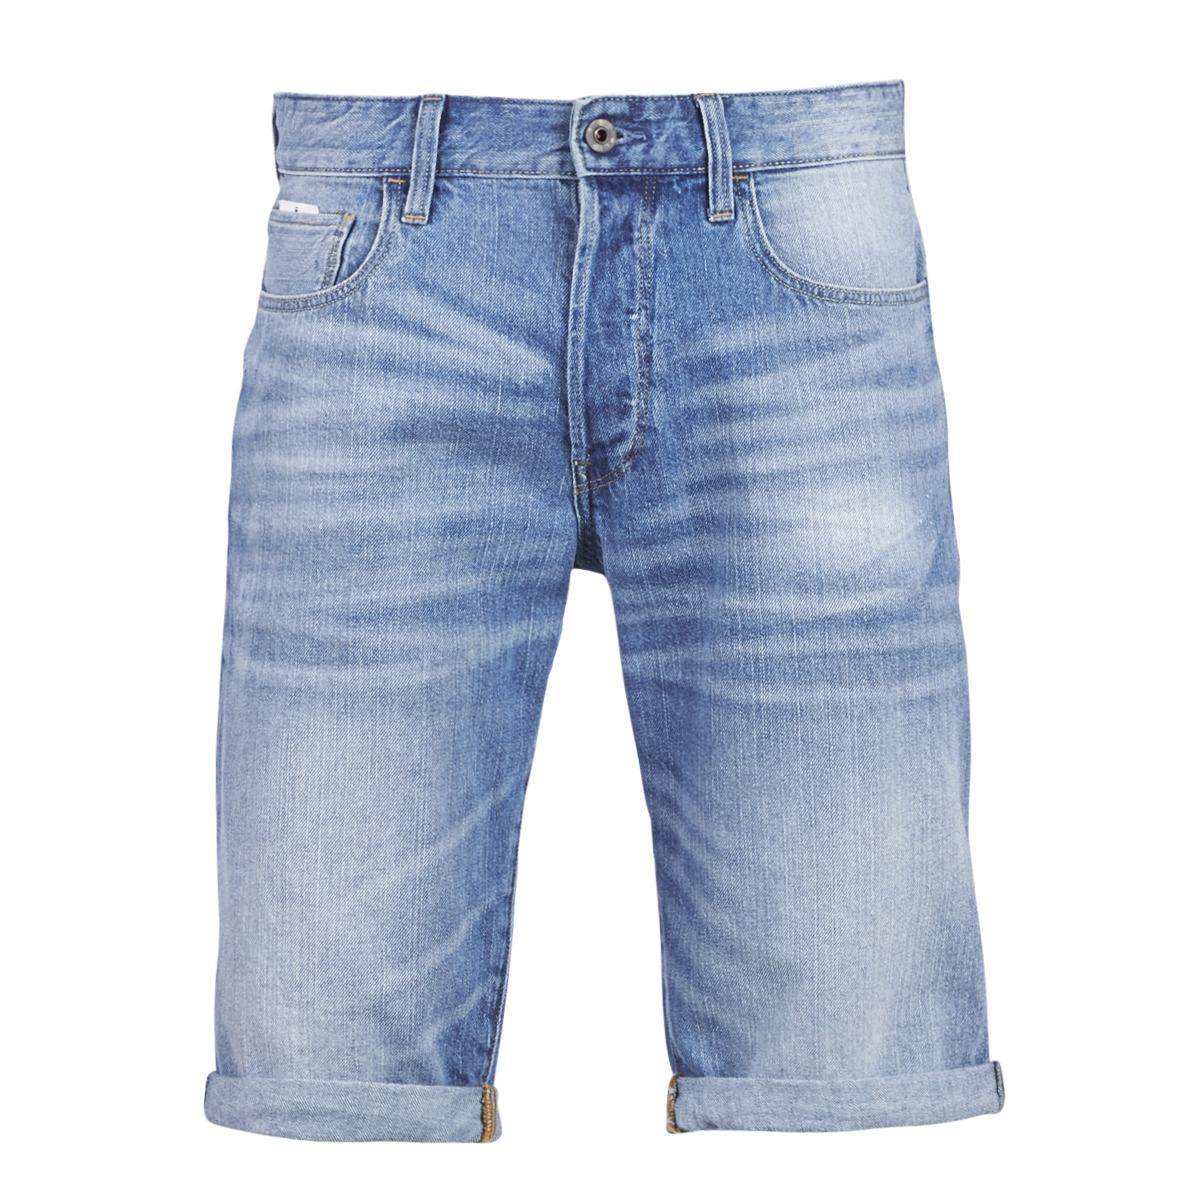 Shorts G-Star Raw  3302 12